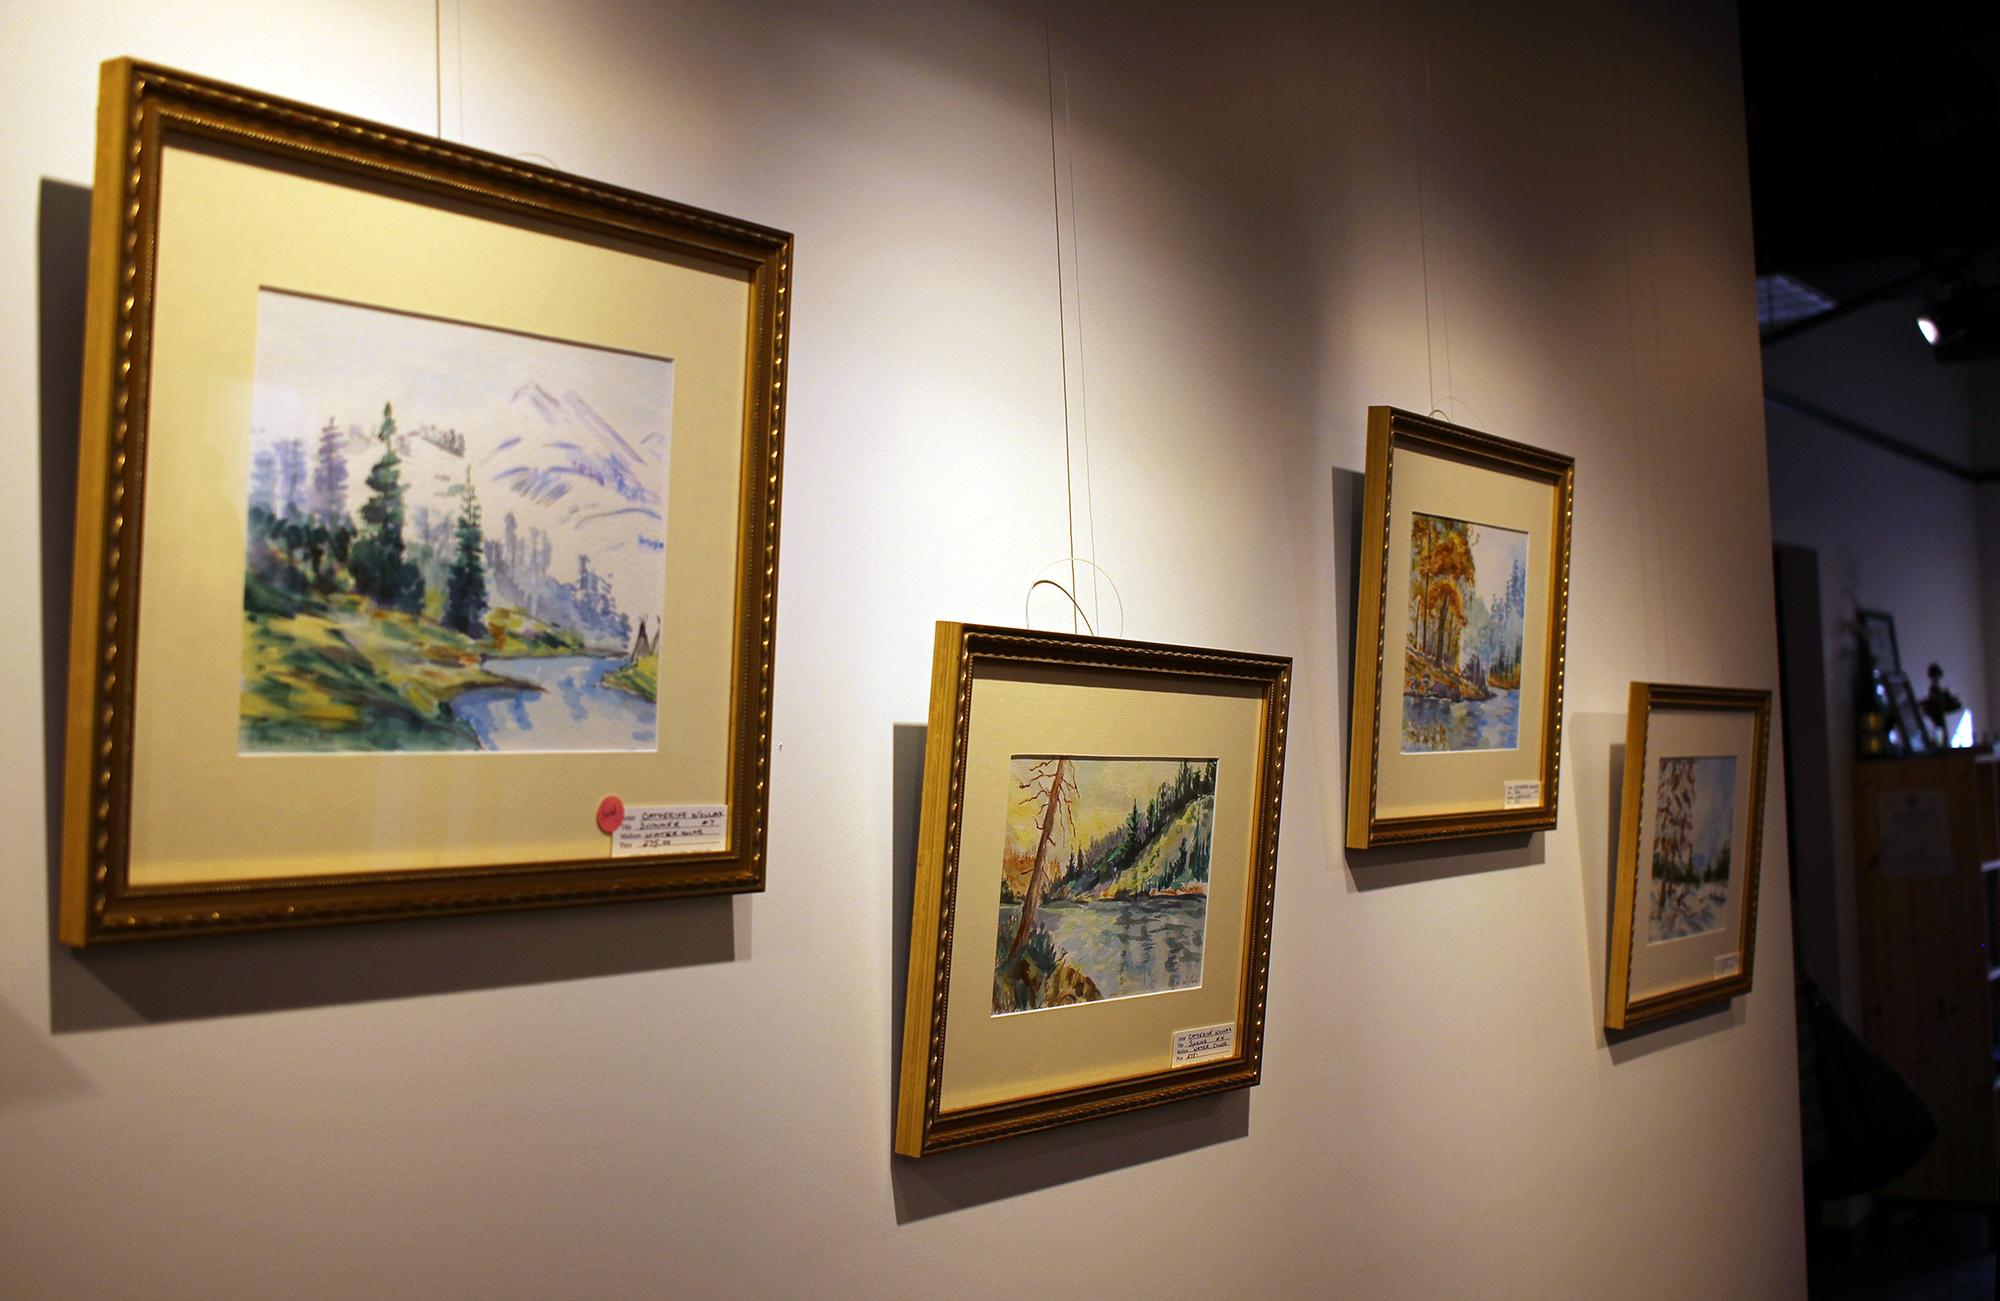 Artist Wollak's Work Displayed at Medfield TV